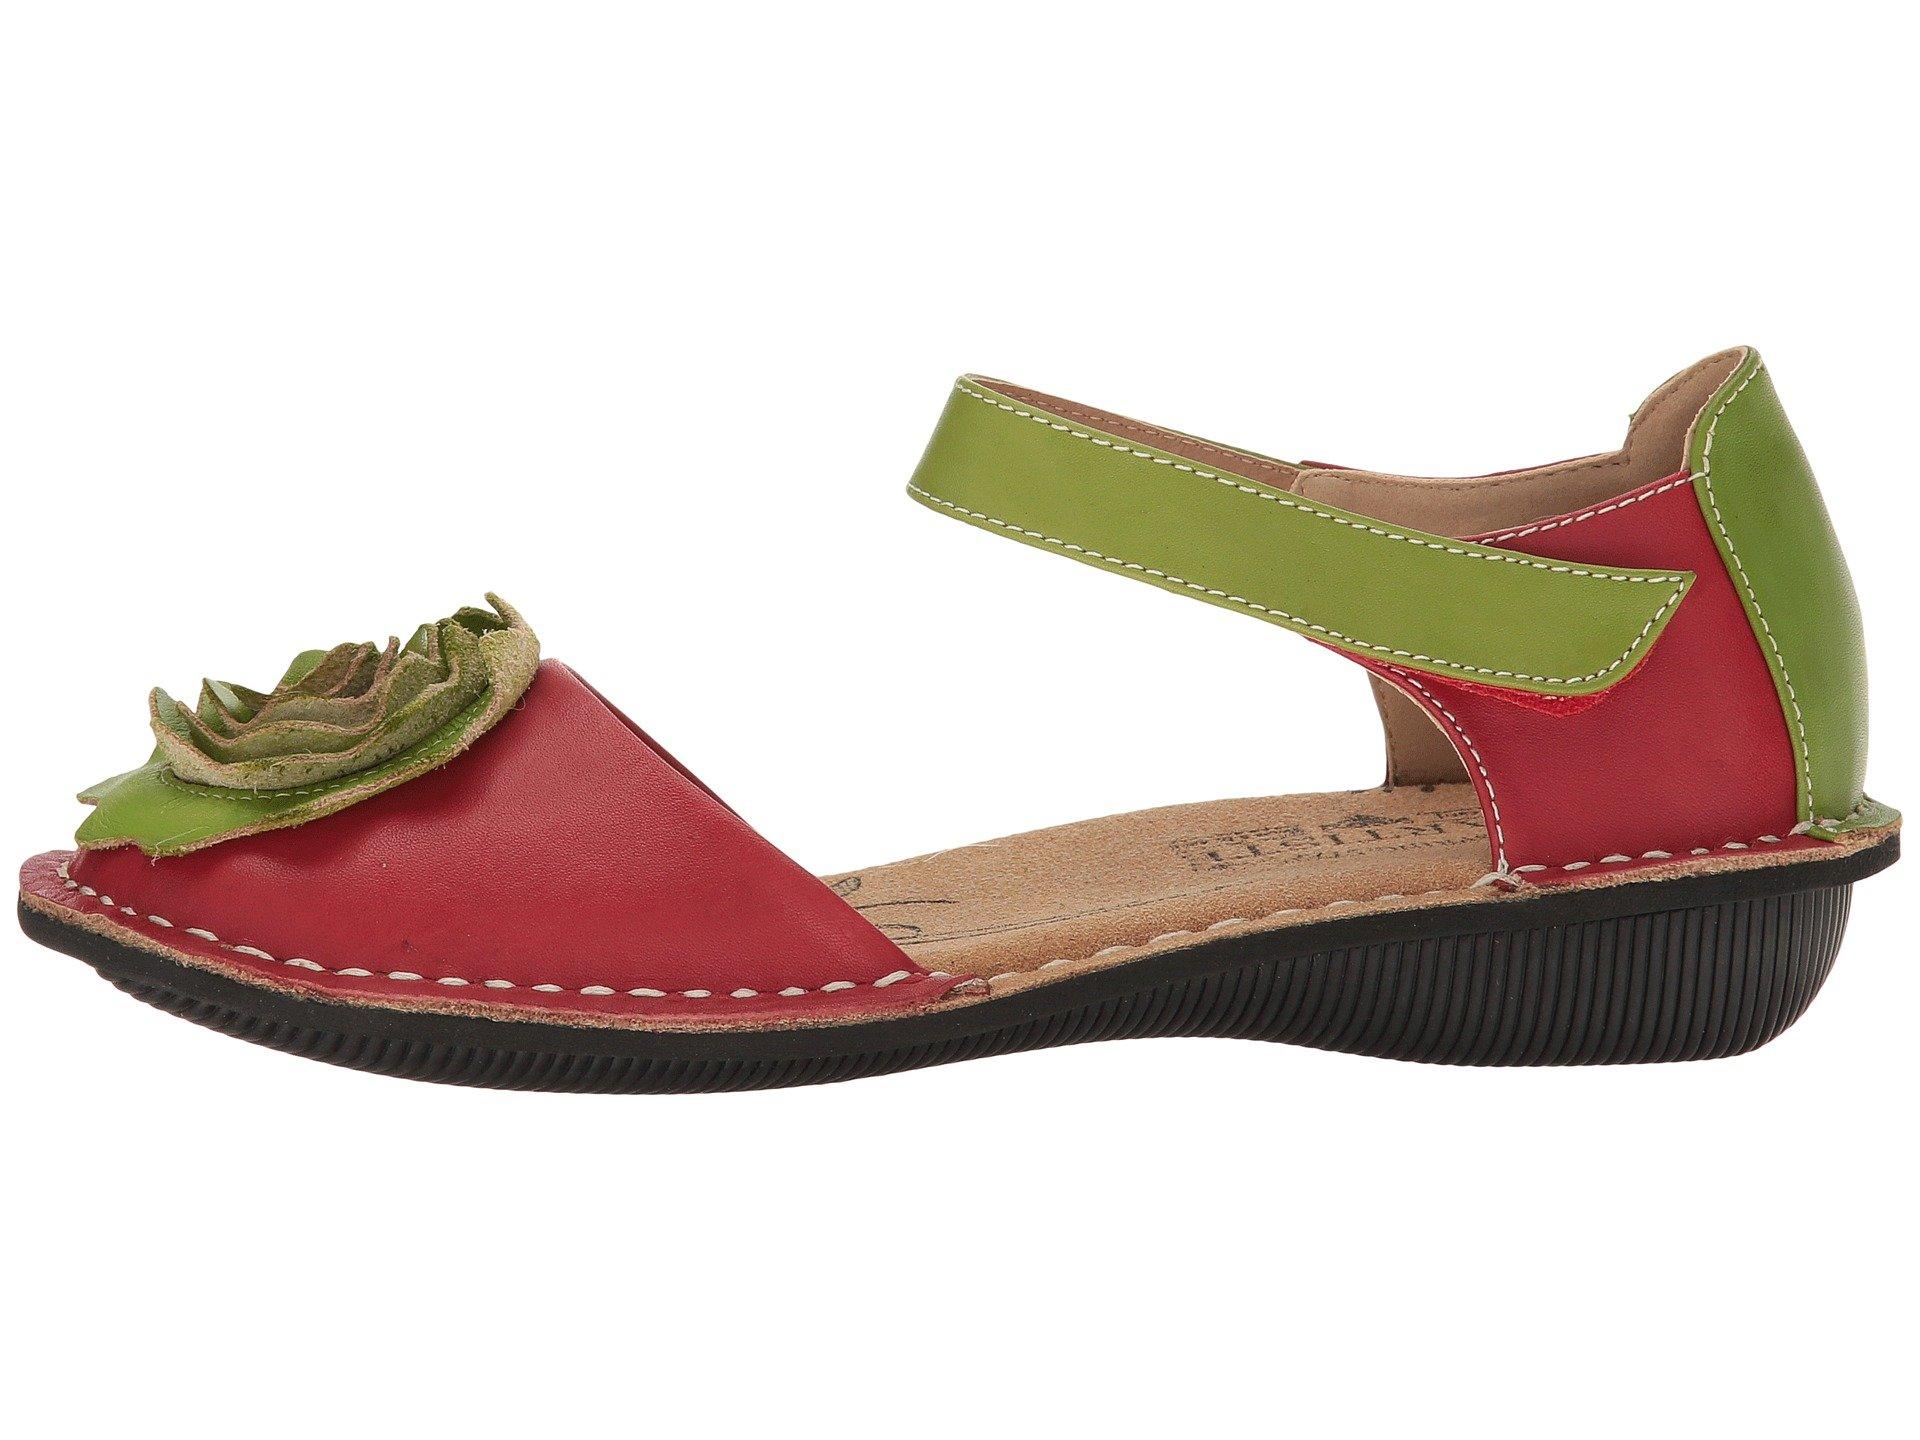 Girls What Is Ur Favorite Shoes Color On Men